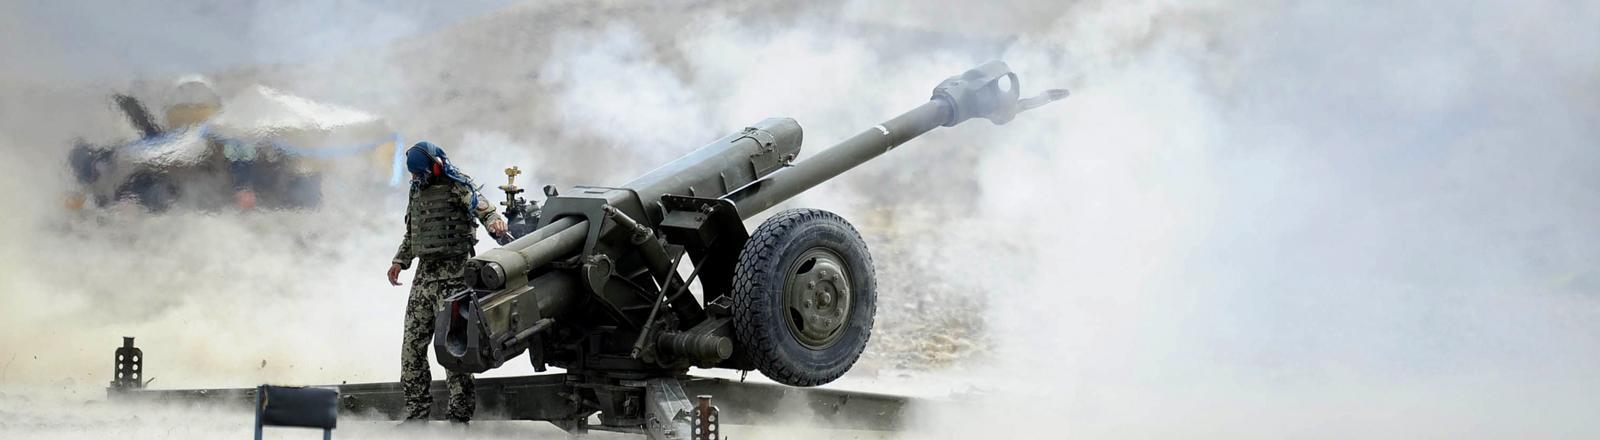 Afghanische Soldaten kämpfen in der Nangarhar-Provinz gegen den IS